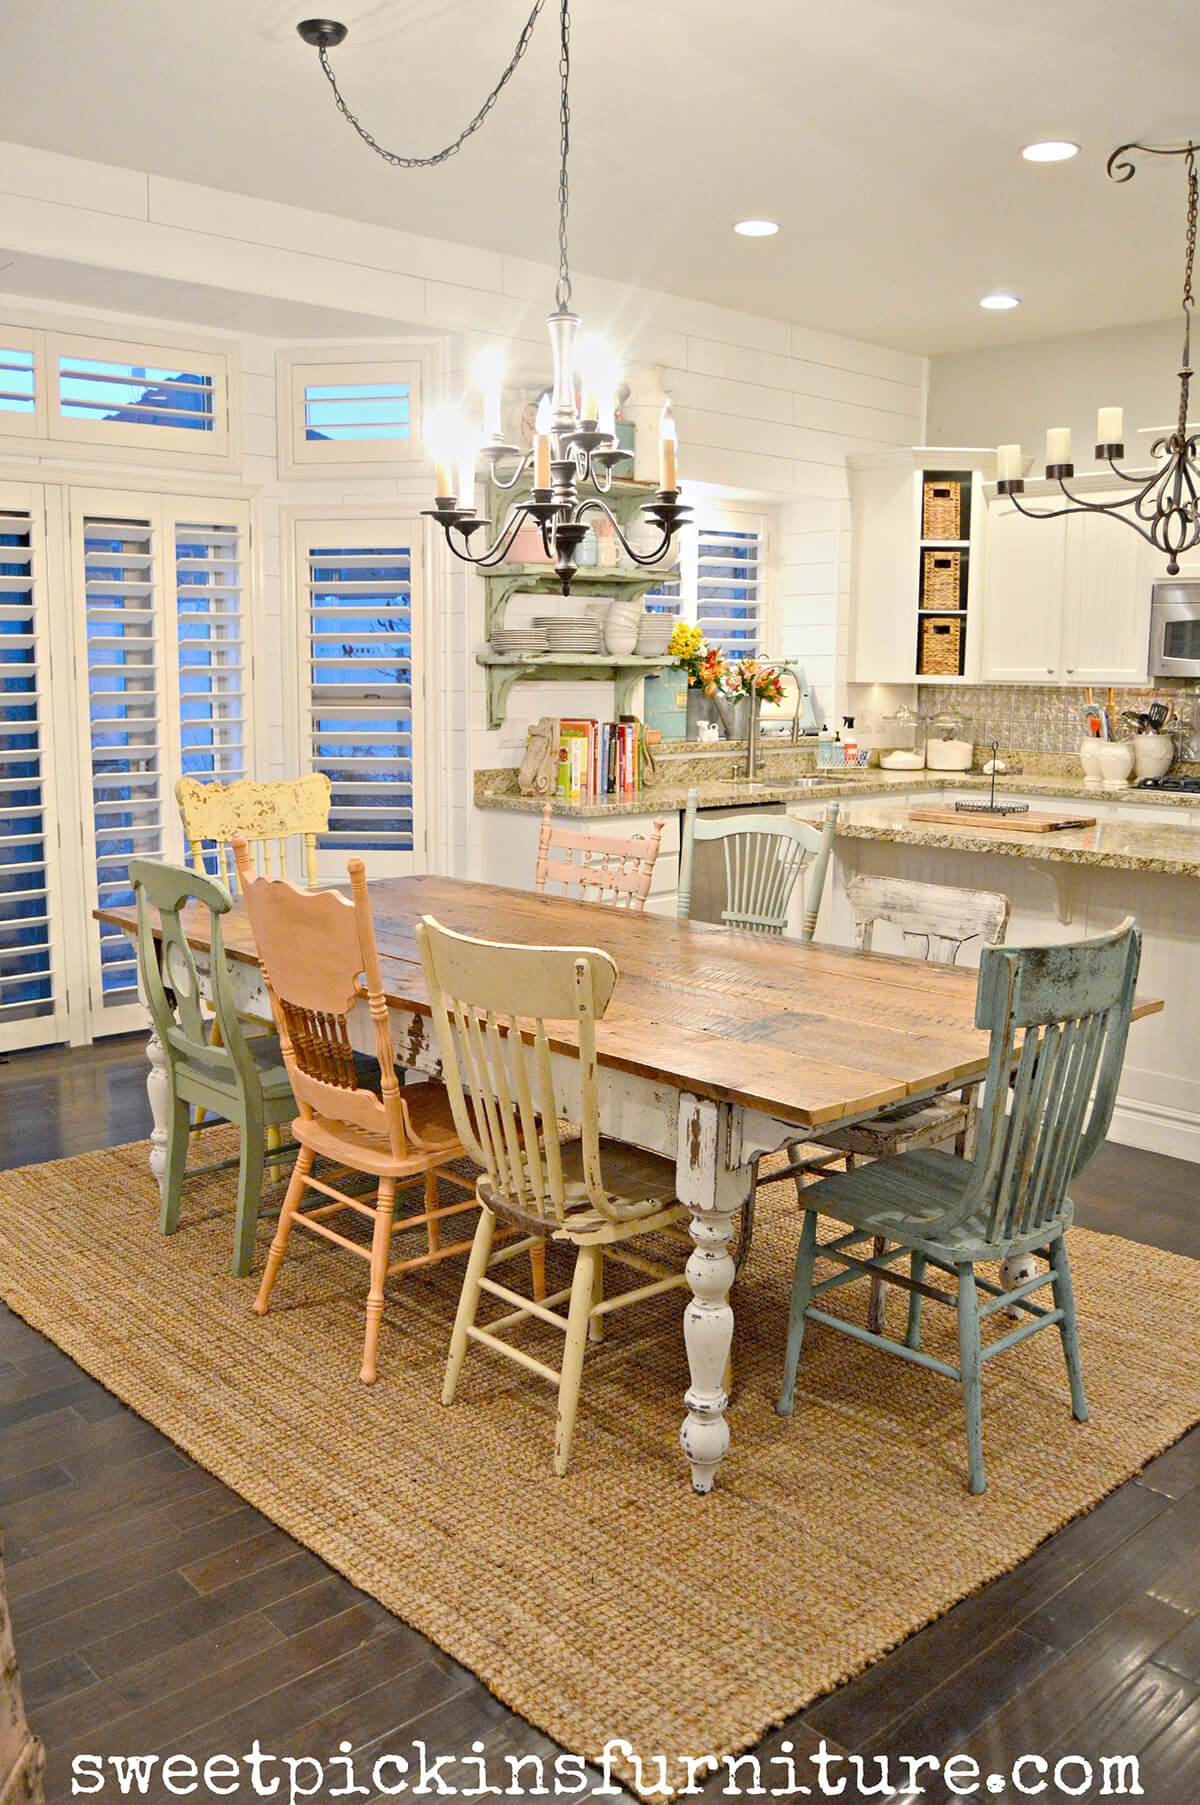 17 Charming Farmhouse Dining Room Design And Decor Ideas